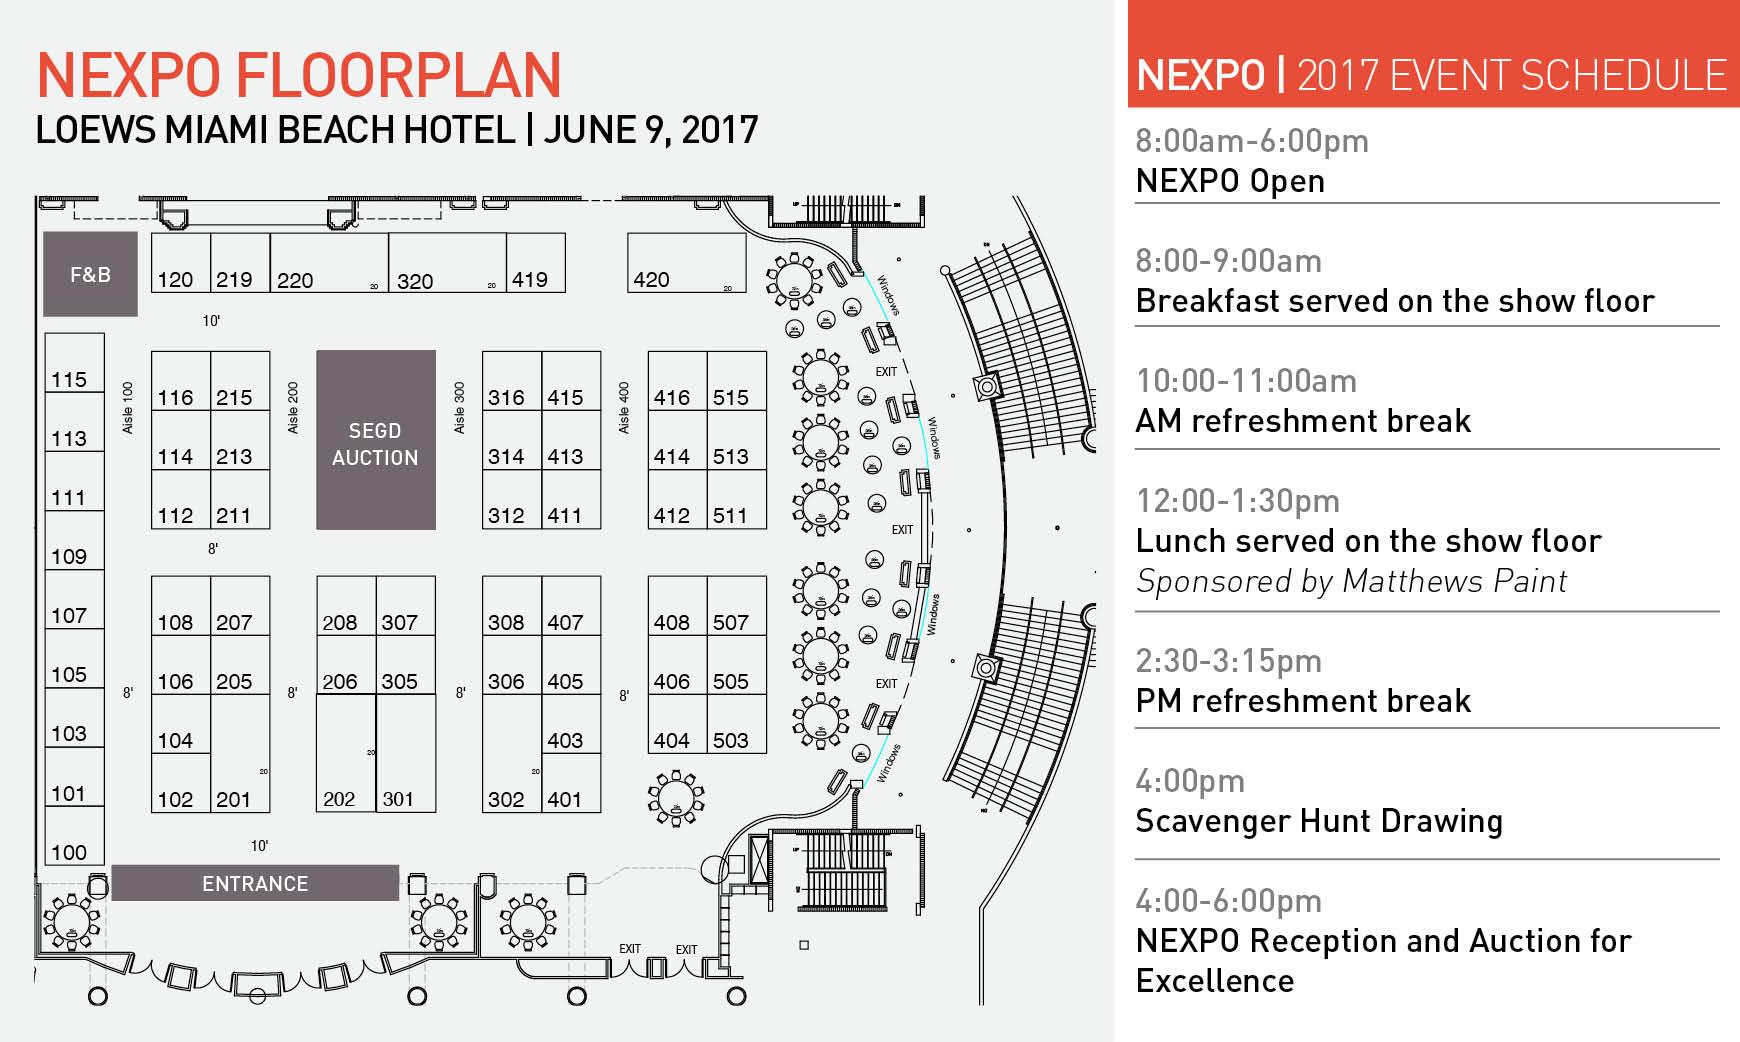 2017 NEXPO Floorplan and list of events